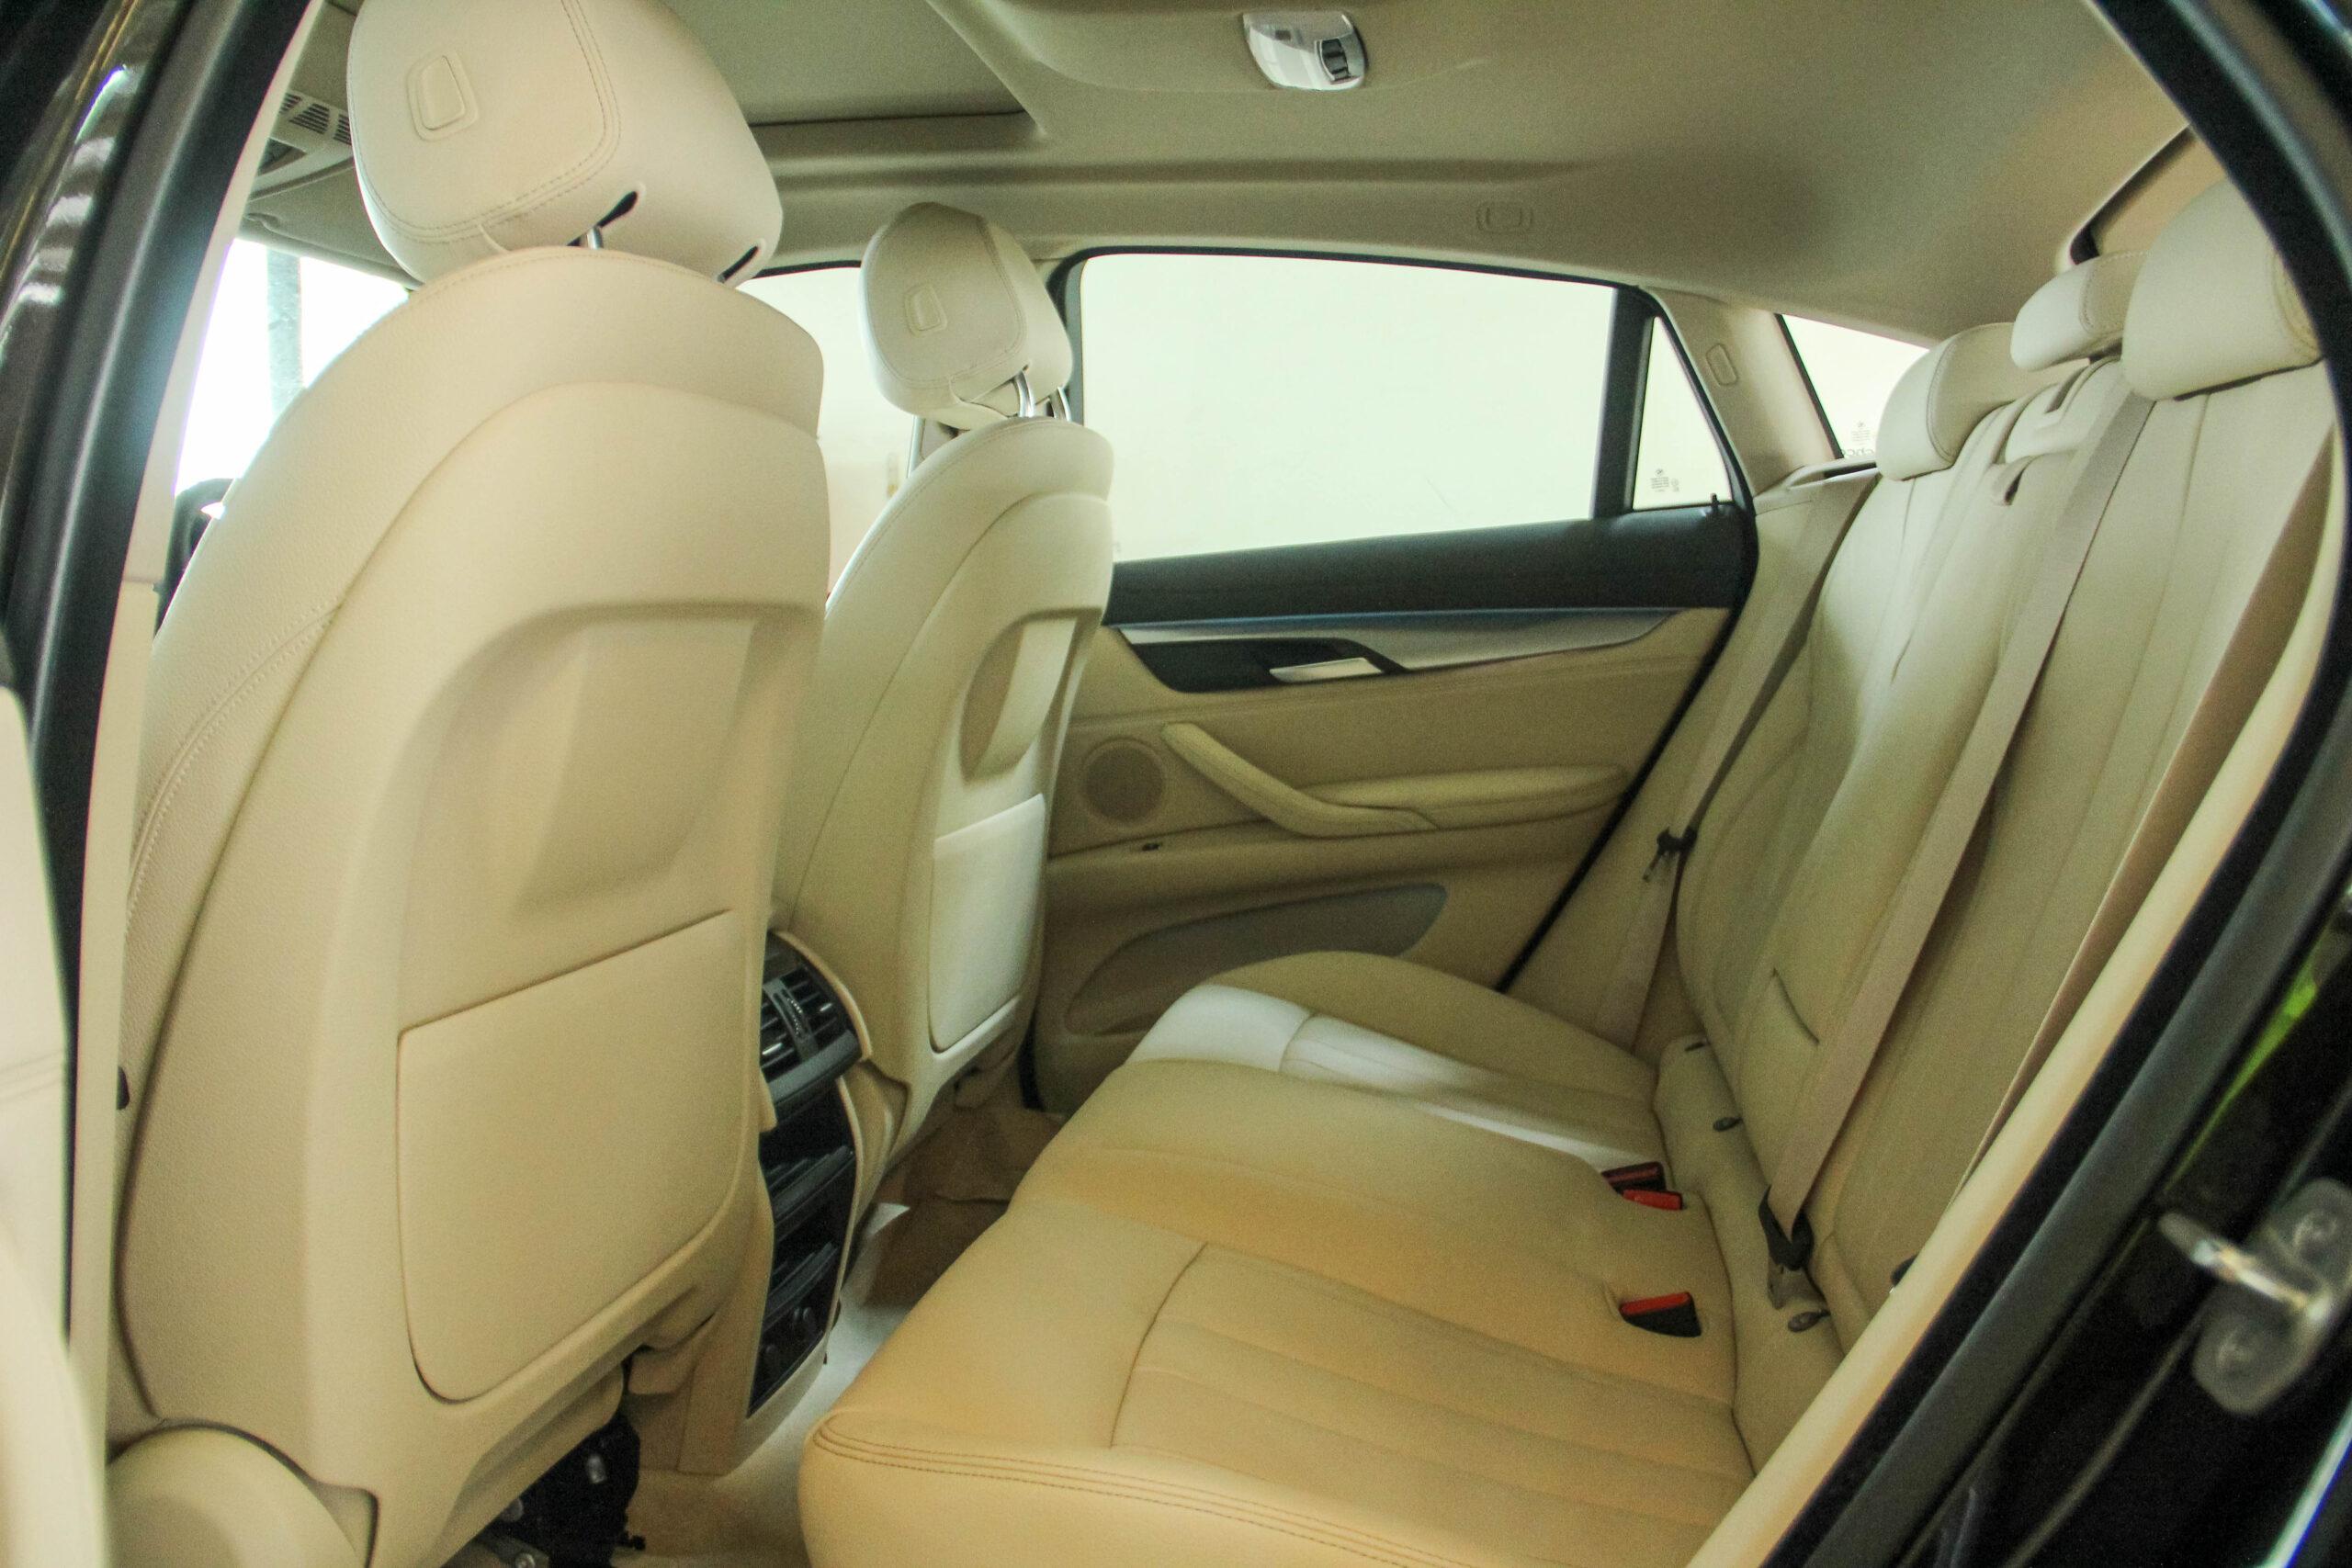 BMW X6 - Inchcape